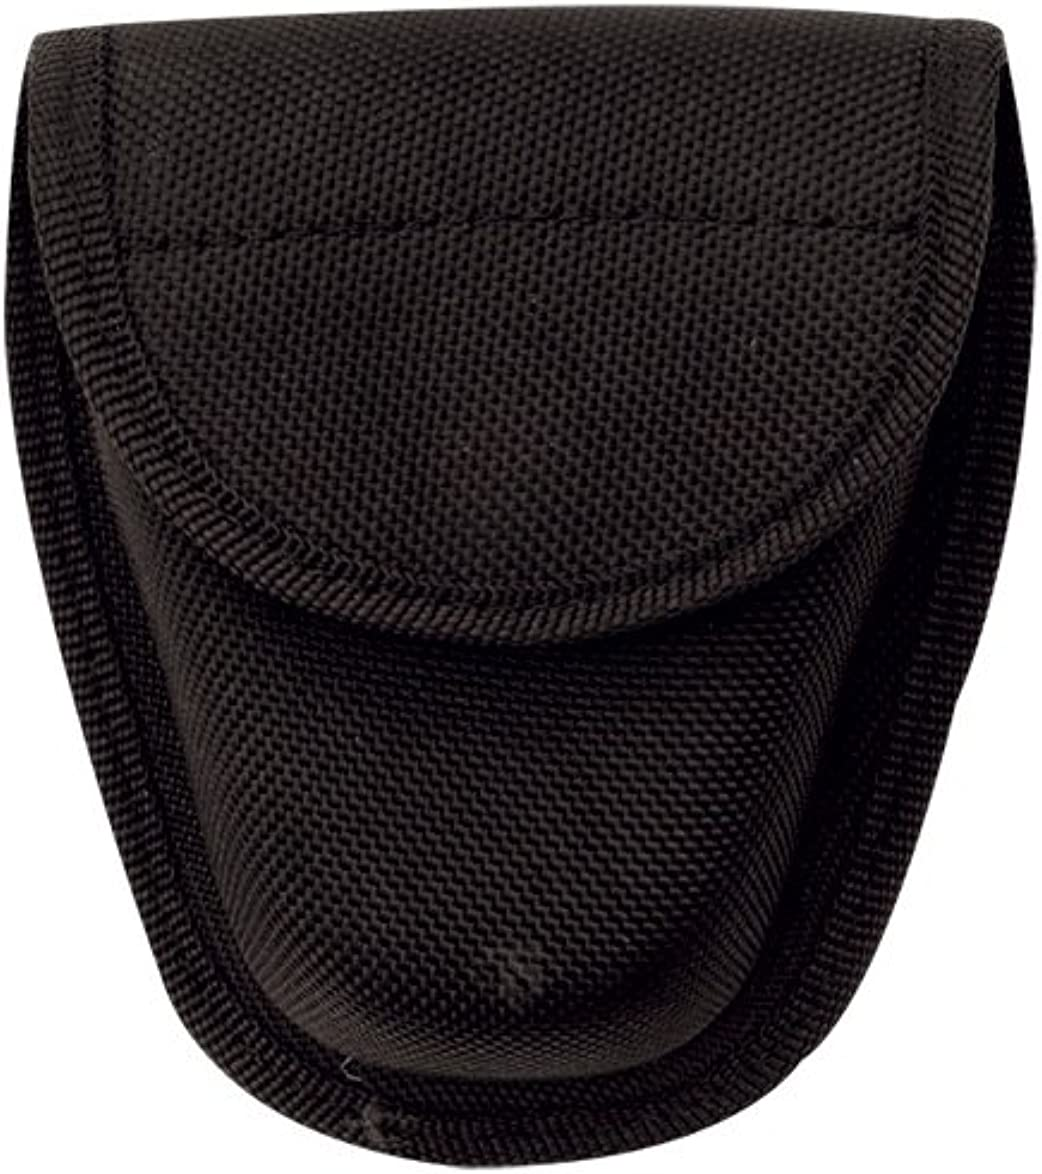 "Tru-Spec 9036000 Black Hid Snap Double Nylon Handcuff Case 5-1//3/""x 4-1//2/"""